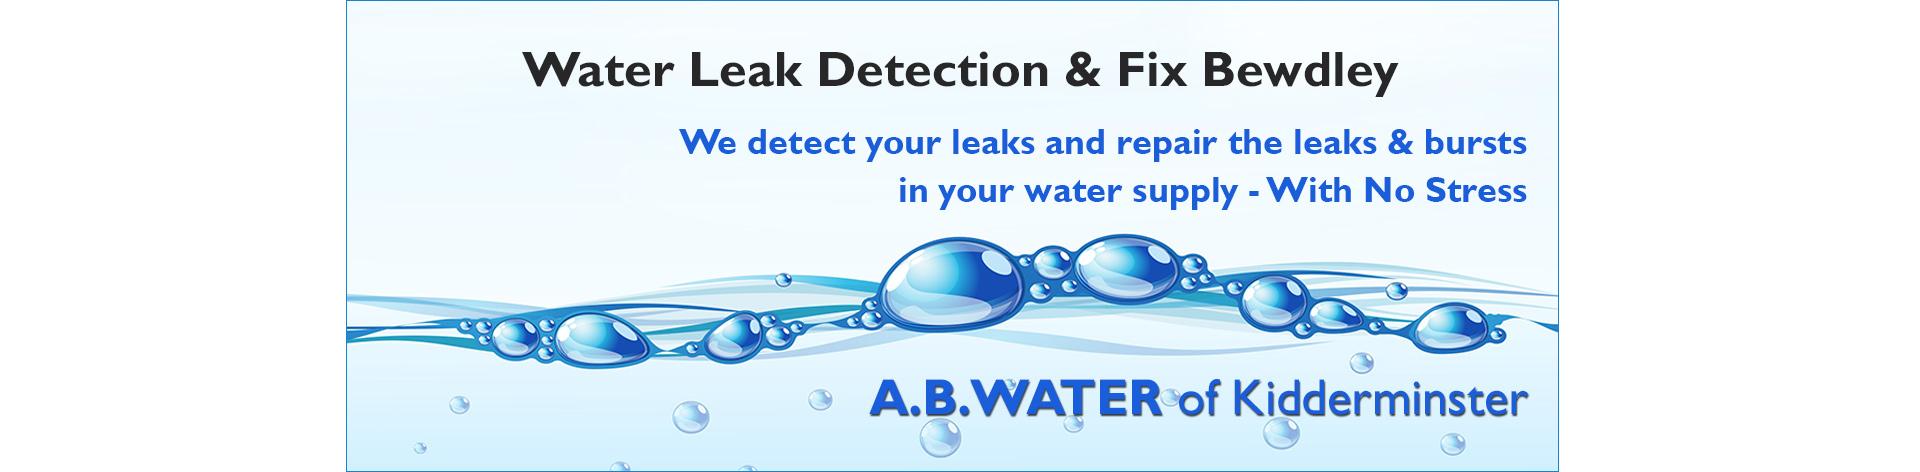 leak-detection-bewdley